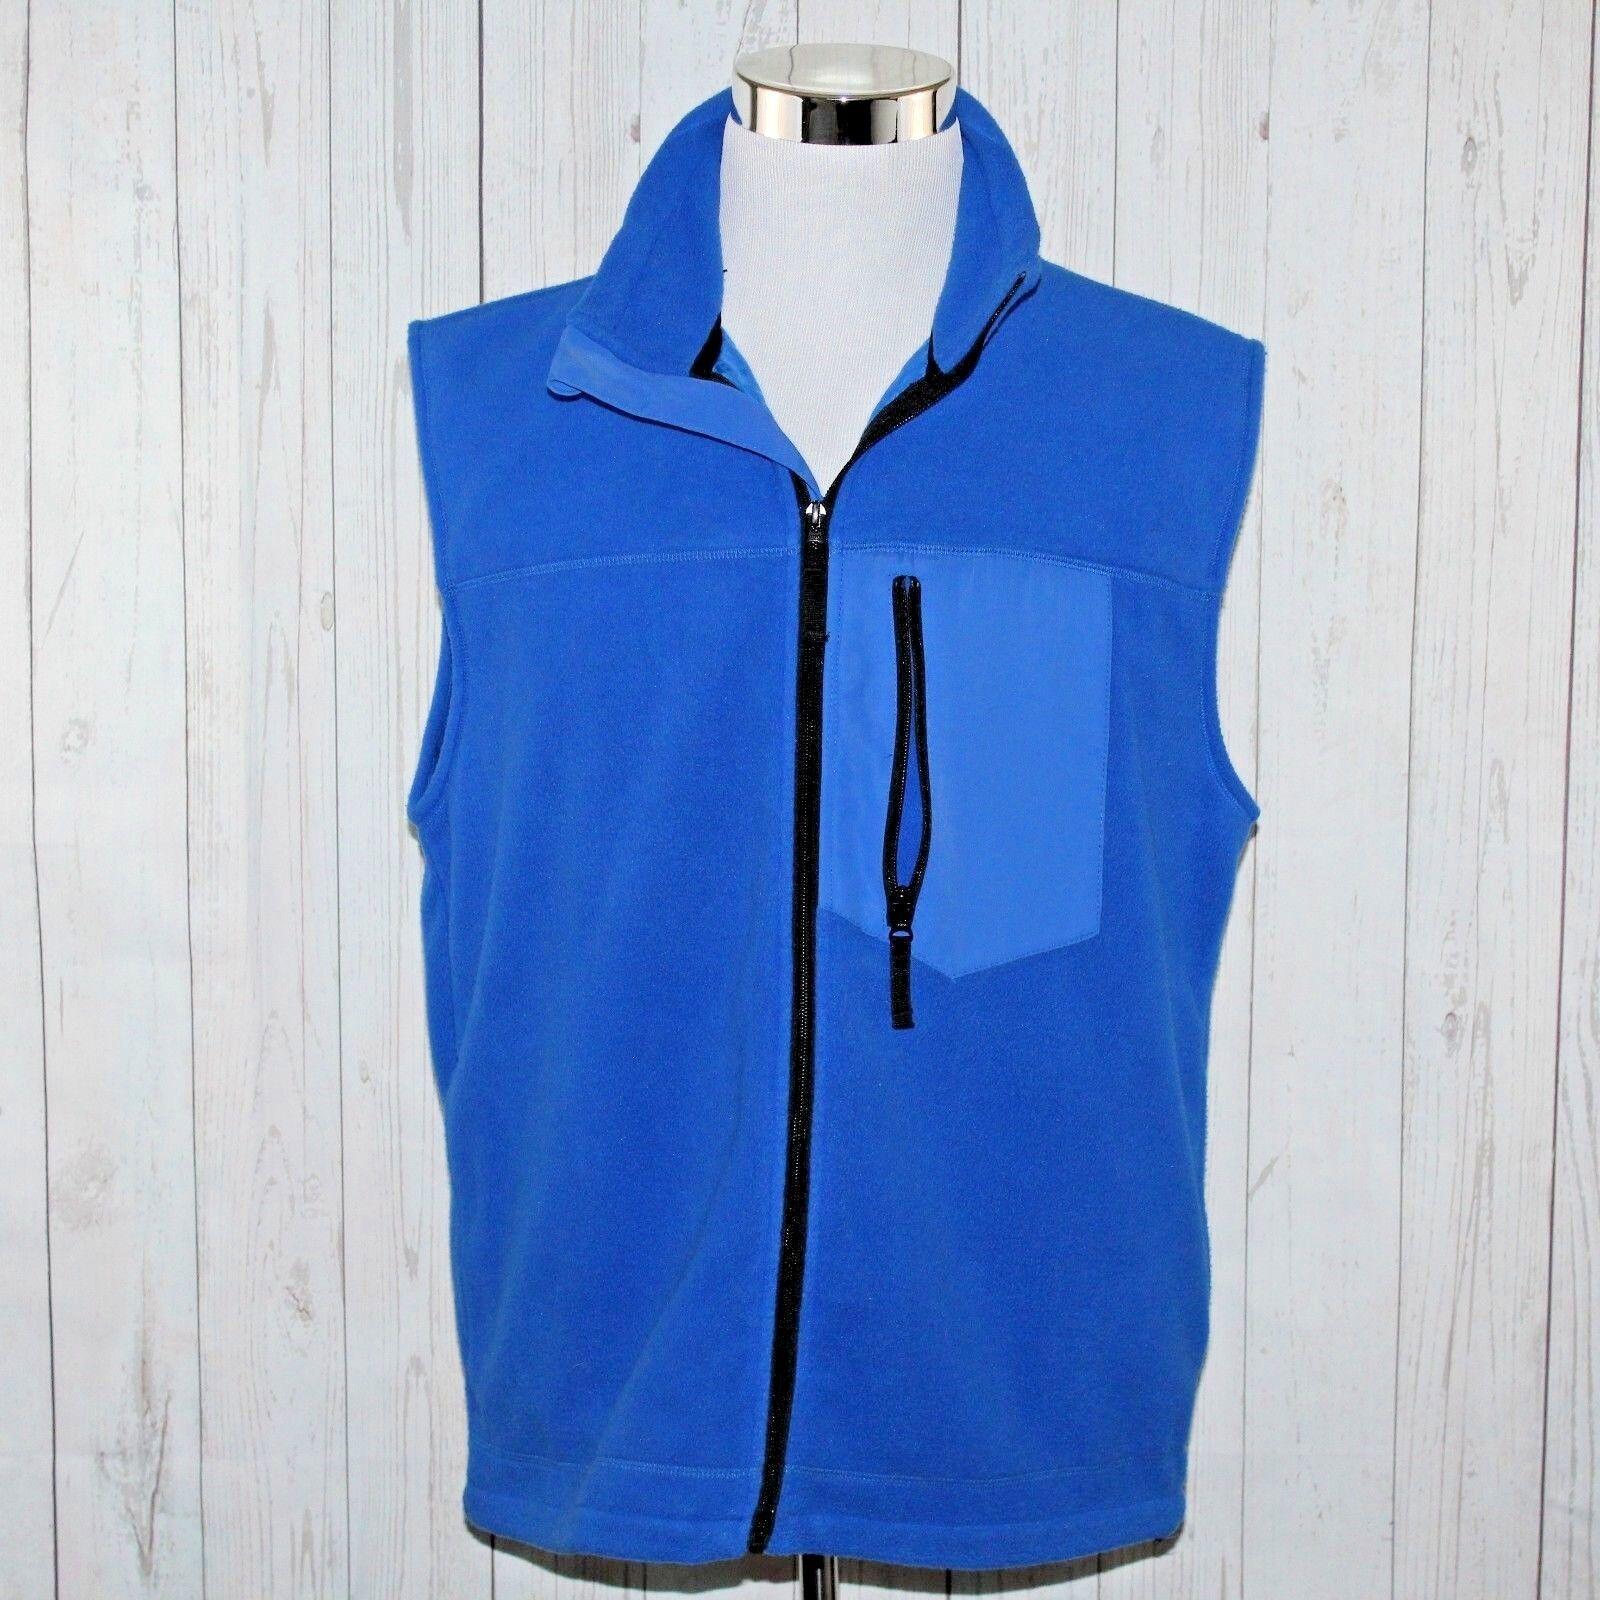 1cf0bd37bf Trading Co Lrg Tall L T Lined Full Zip bluee Polartec Vest Retired Duluth  Fleece nzgarf2953-Coats & Jackets